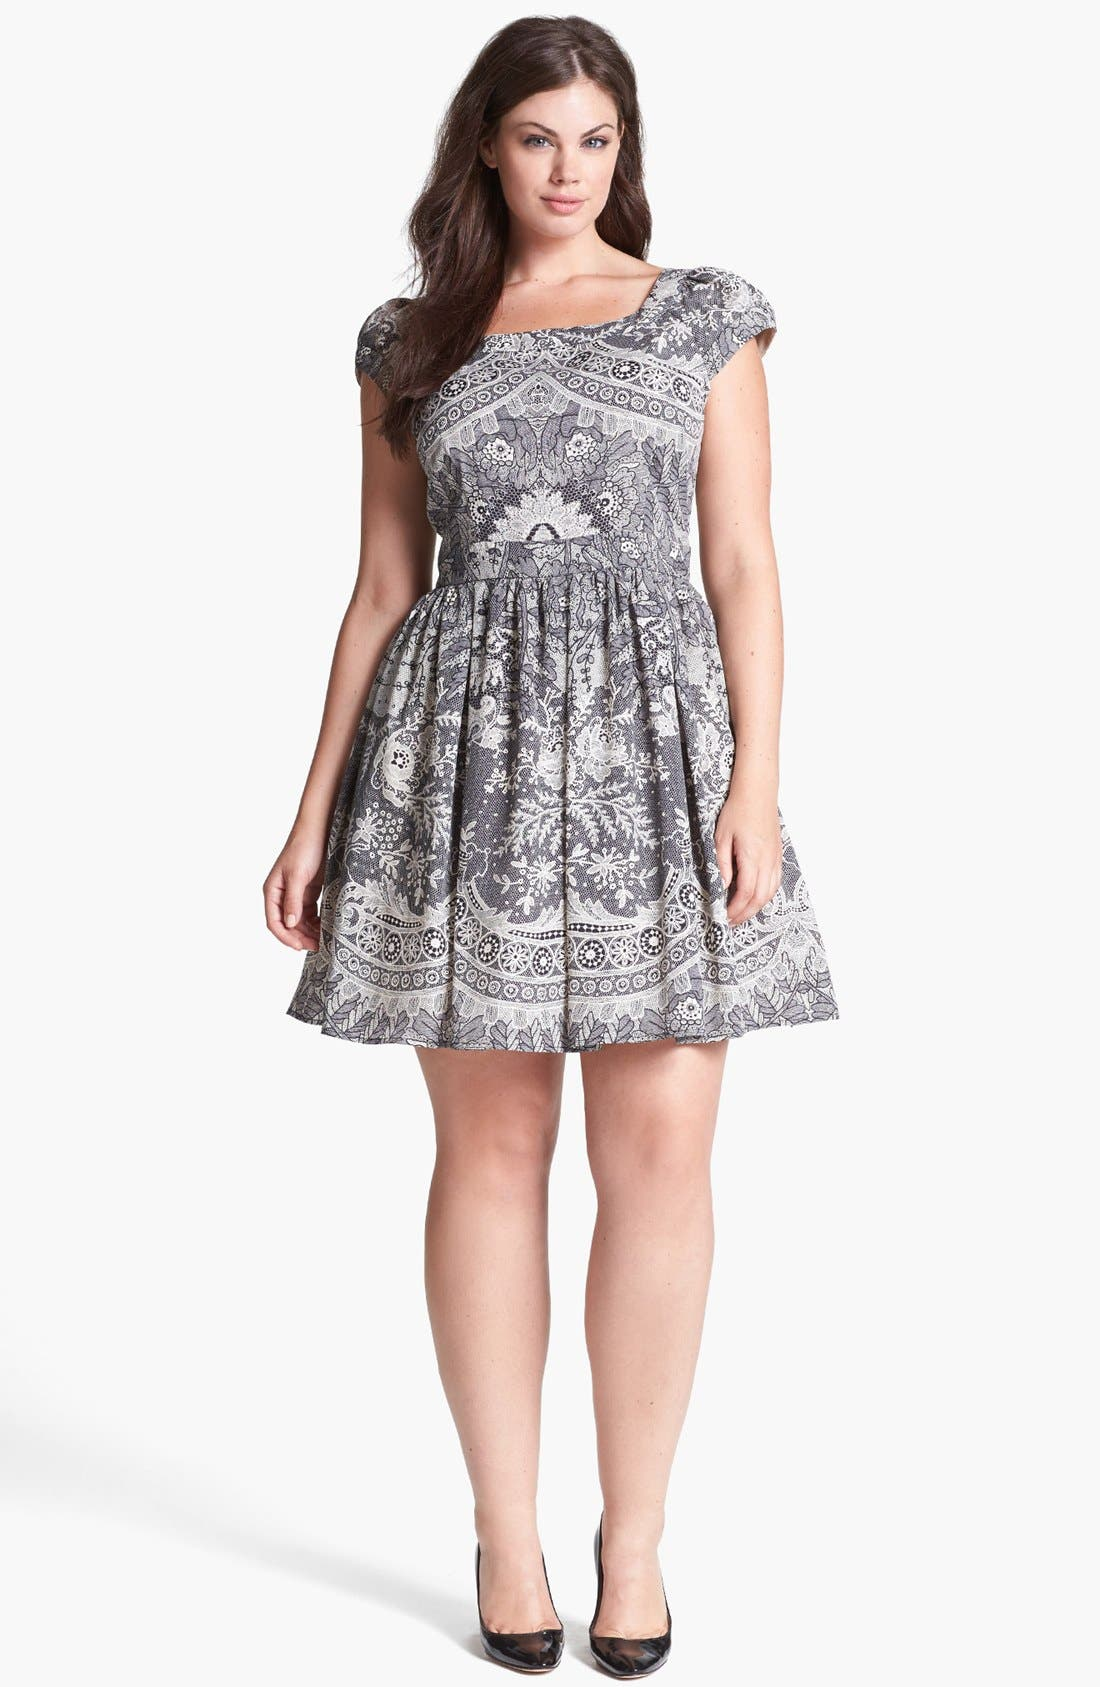 Main Image - ABS by Allen Schwartz Lace Print Fit & Flare Dress (Plus Size)